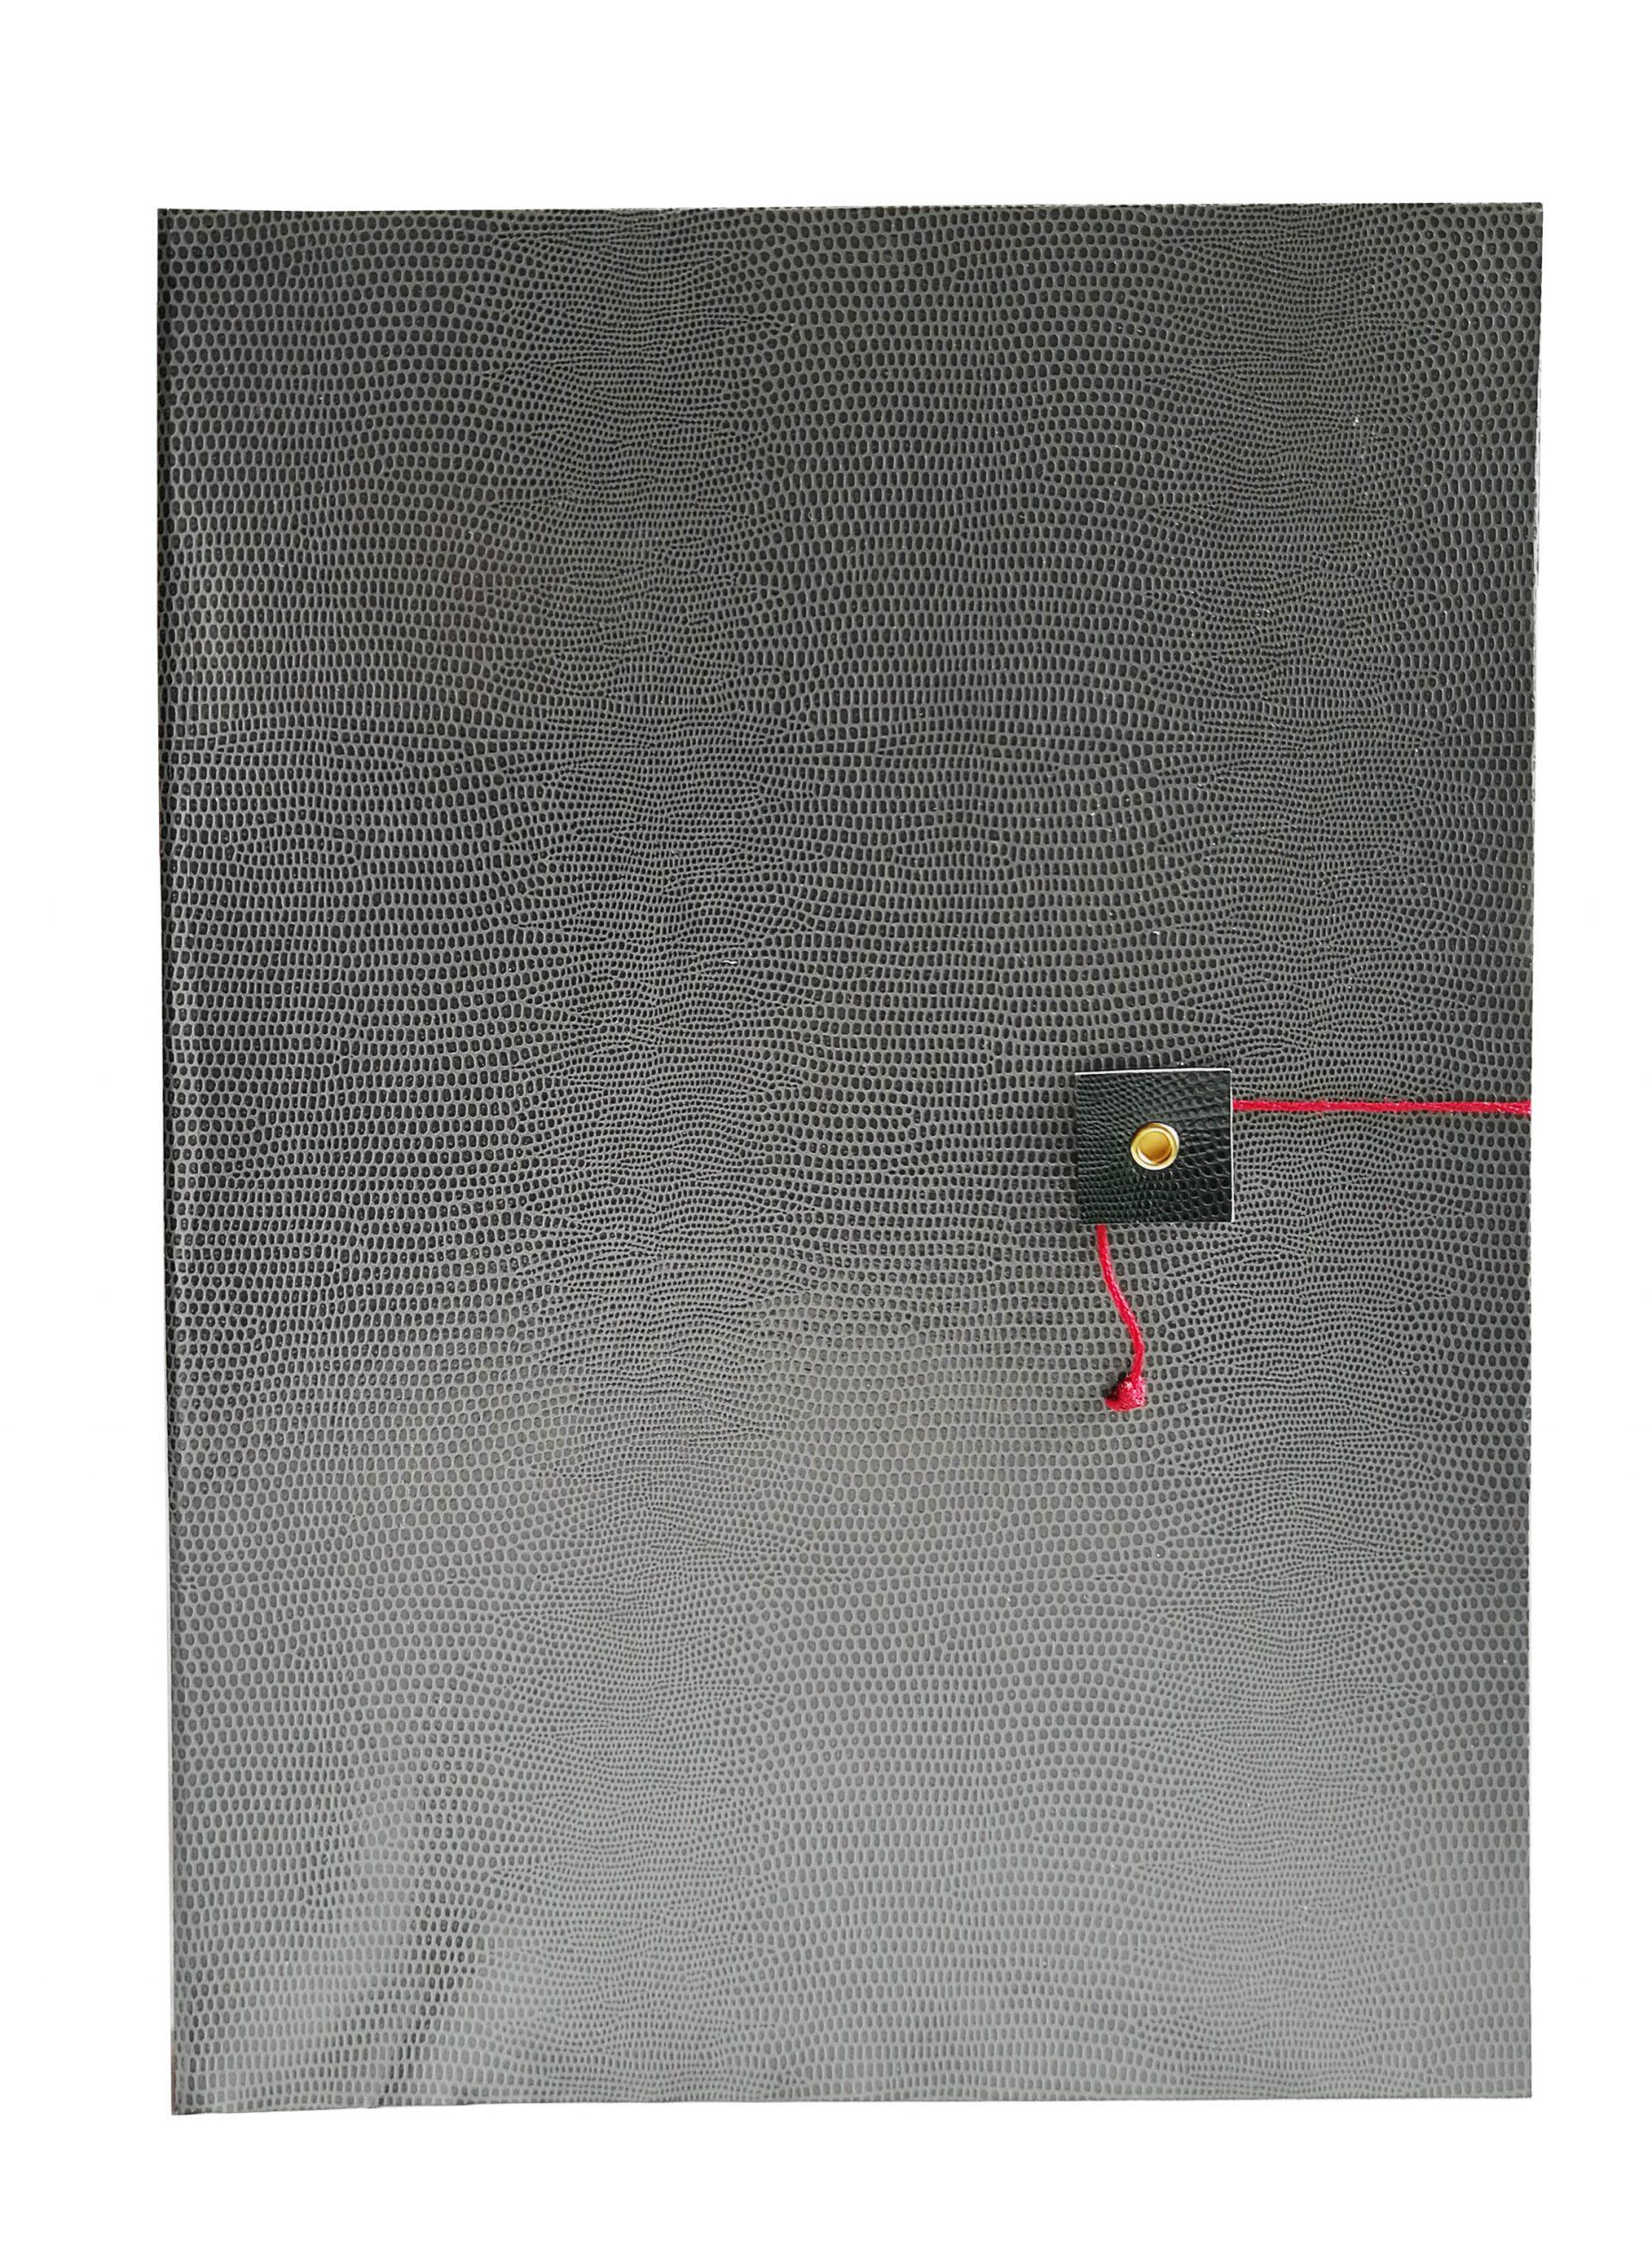 Quaderno Grande A4 Grigio